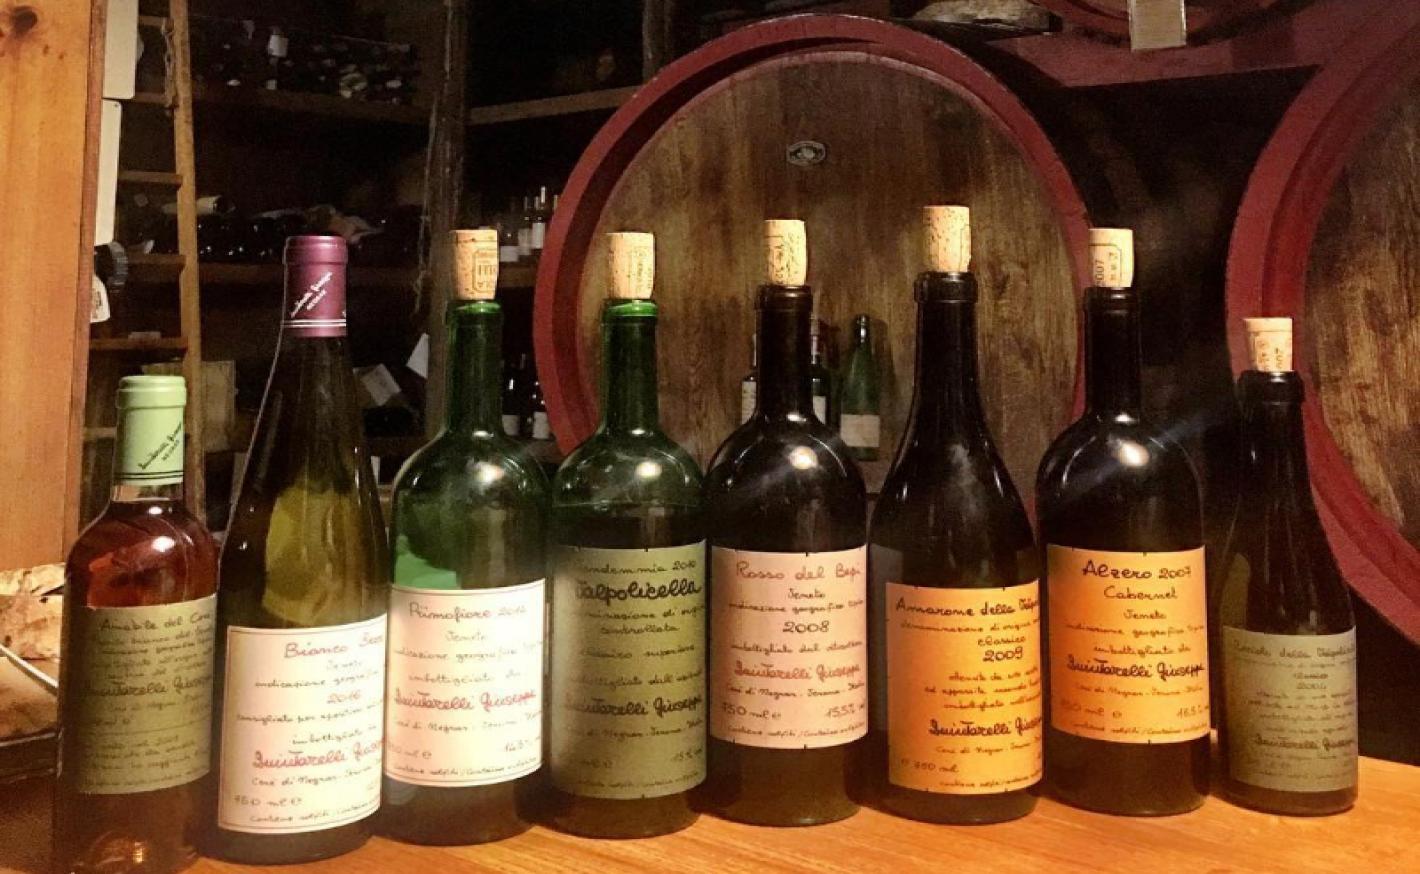 Quintarelli: Legendary Italian Wines Arriving at Noble Grape